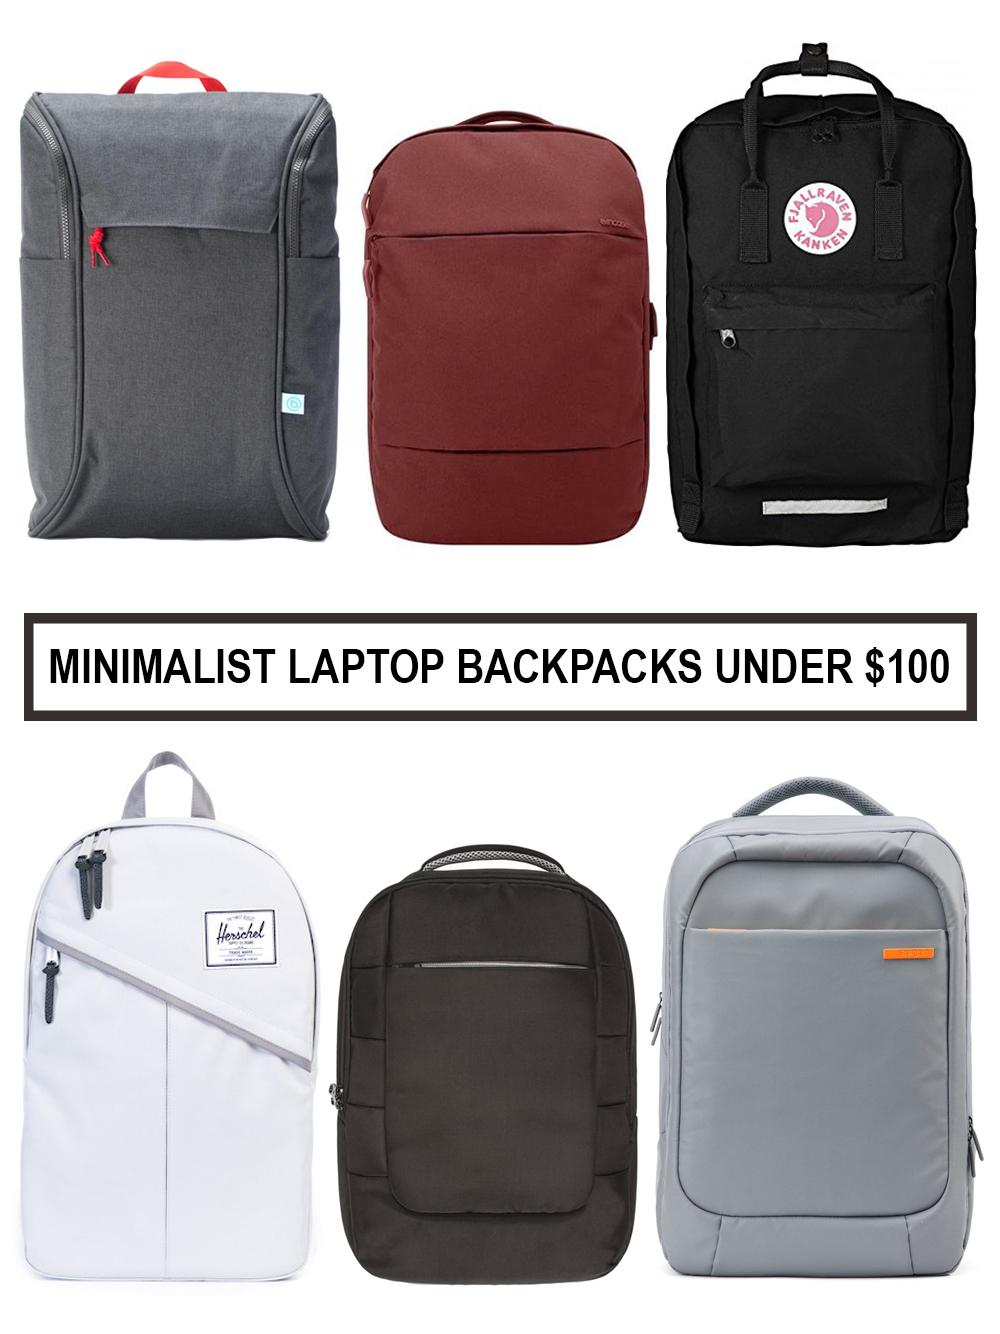 Top Picks for Minimalist Laptop Backpacks under $100 — Minimalist Guy